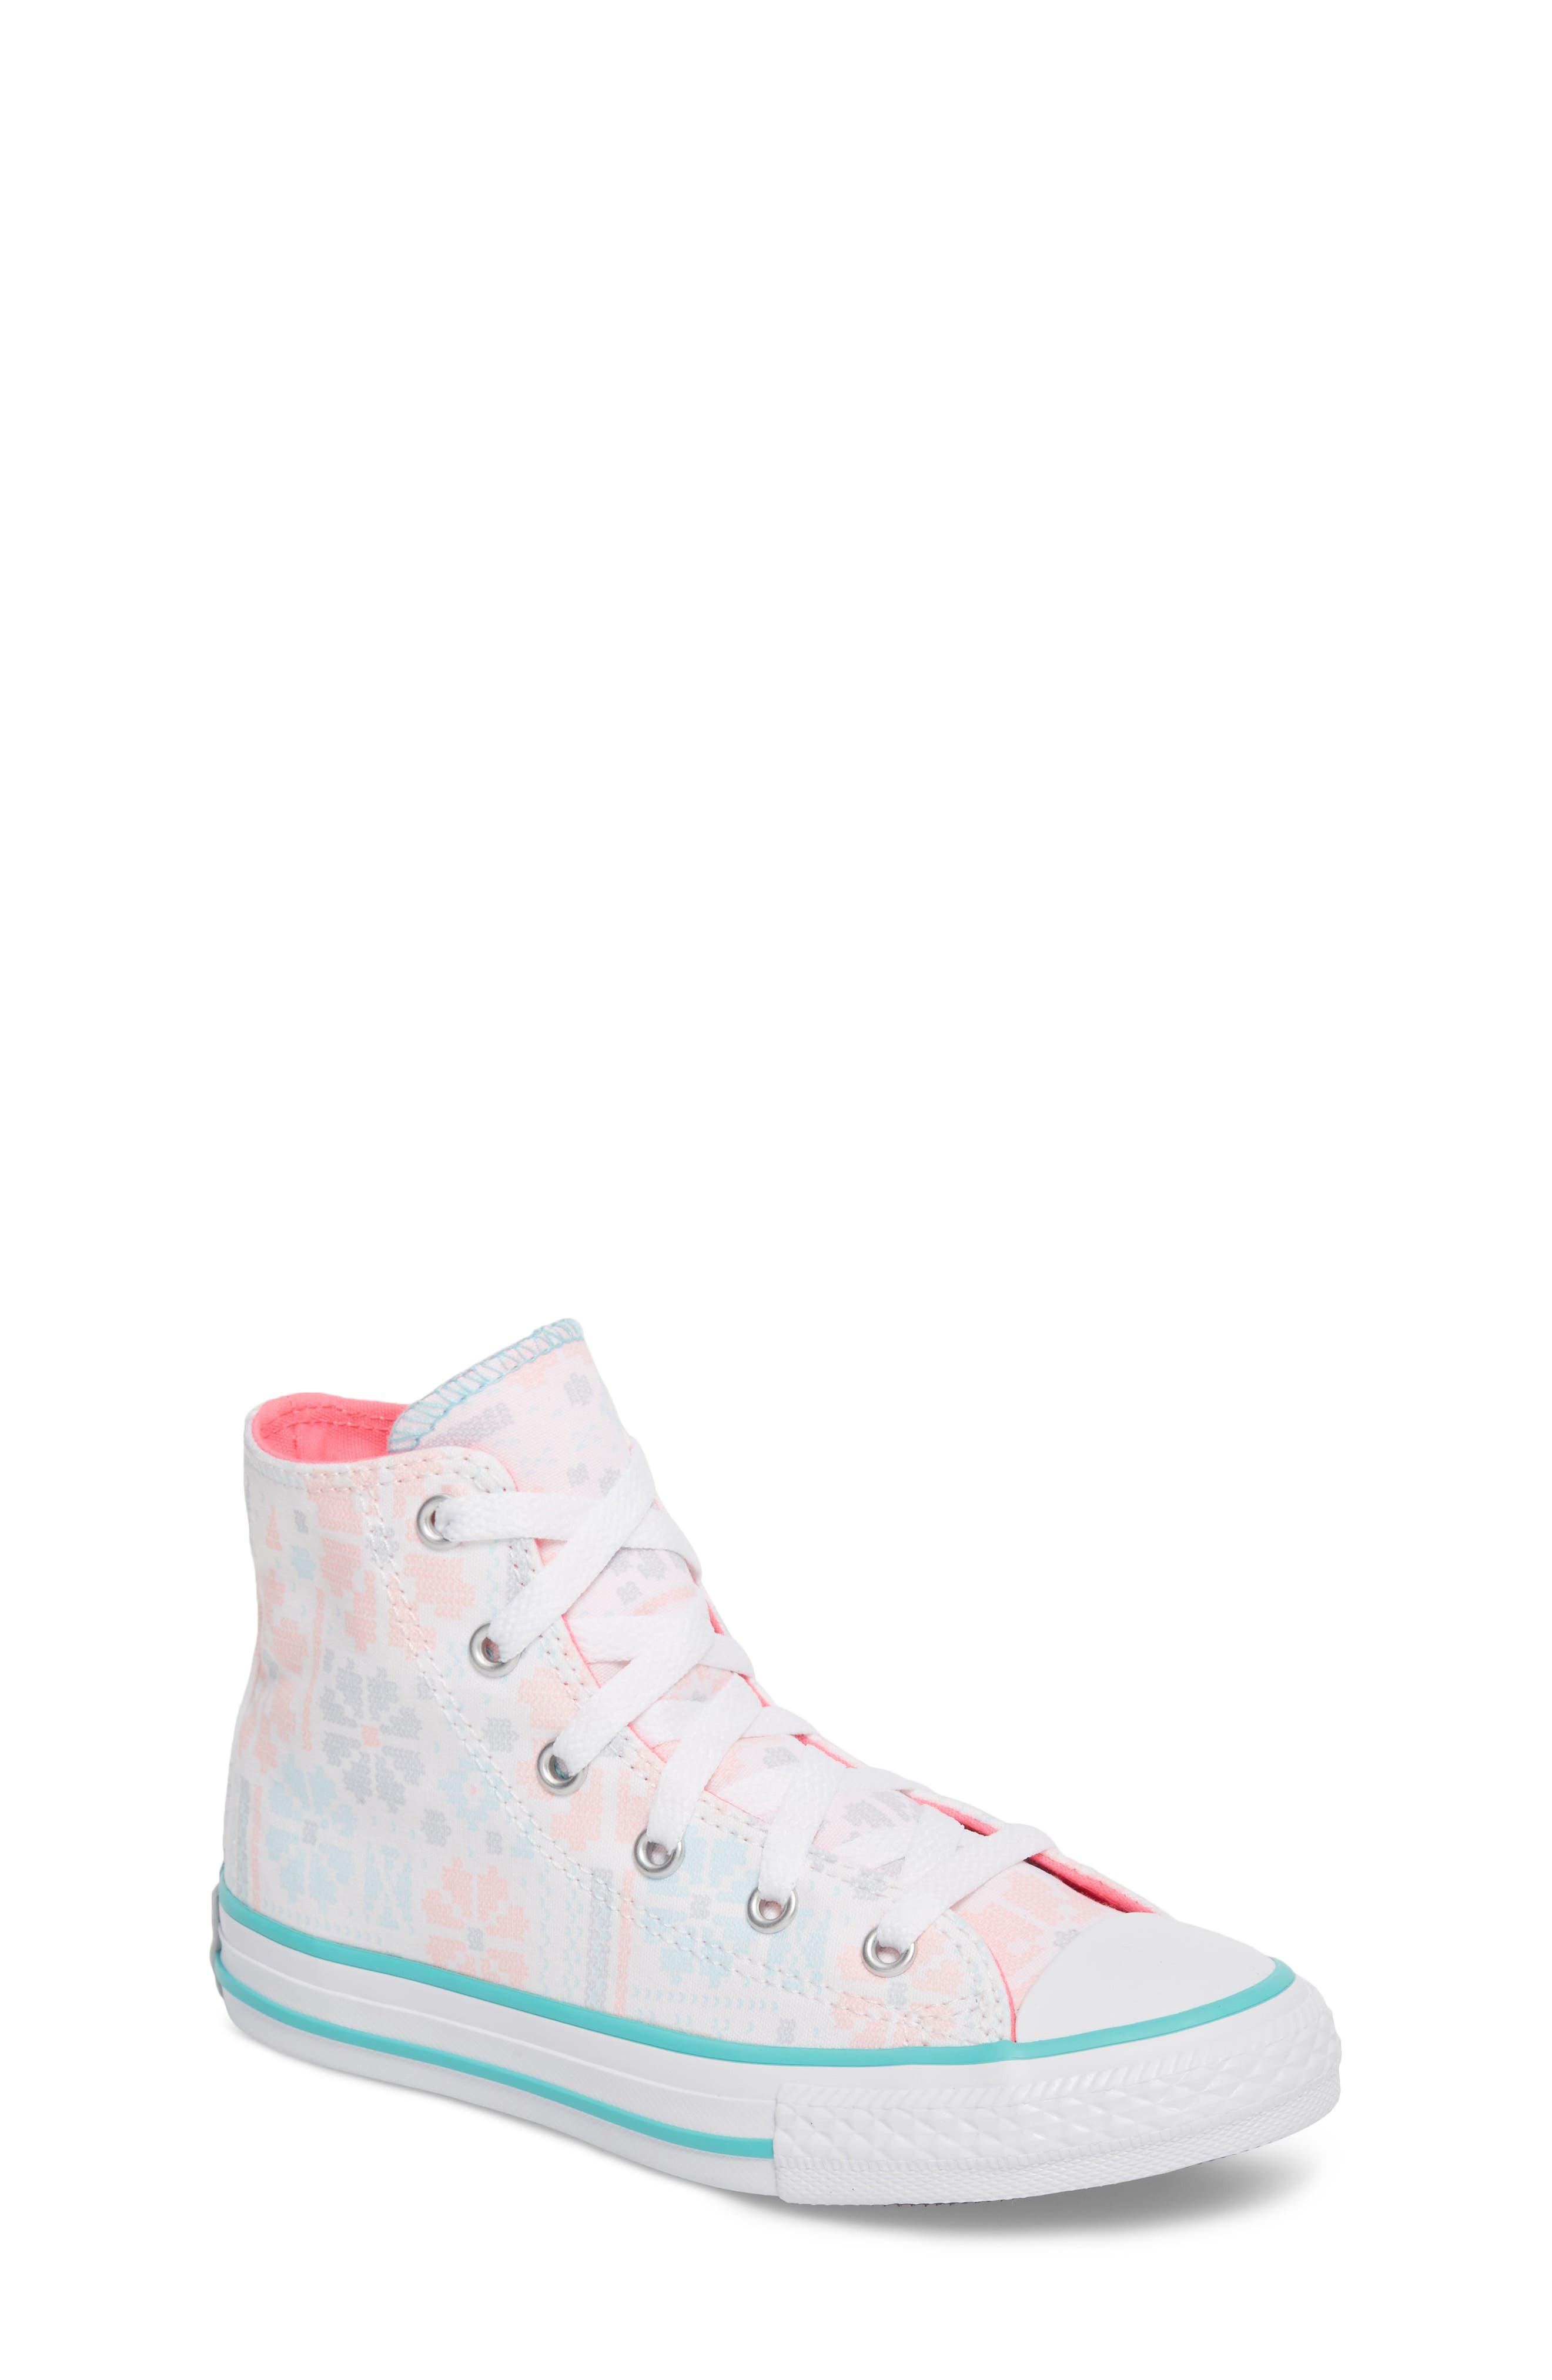 Chuck Taylor<sup>®</sup> All Star<sup>®</sup> High Top Sneaker,                             Main thumbnail 1, color,